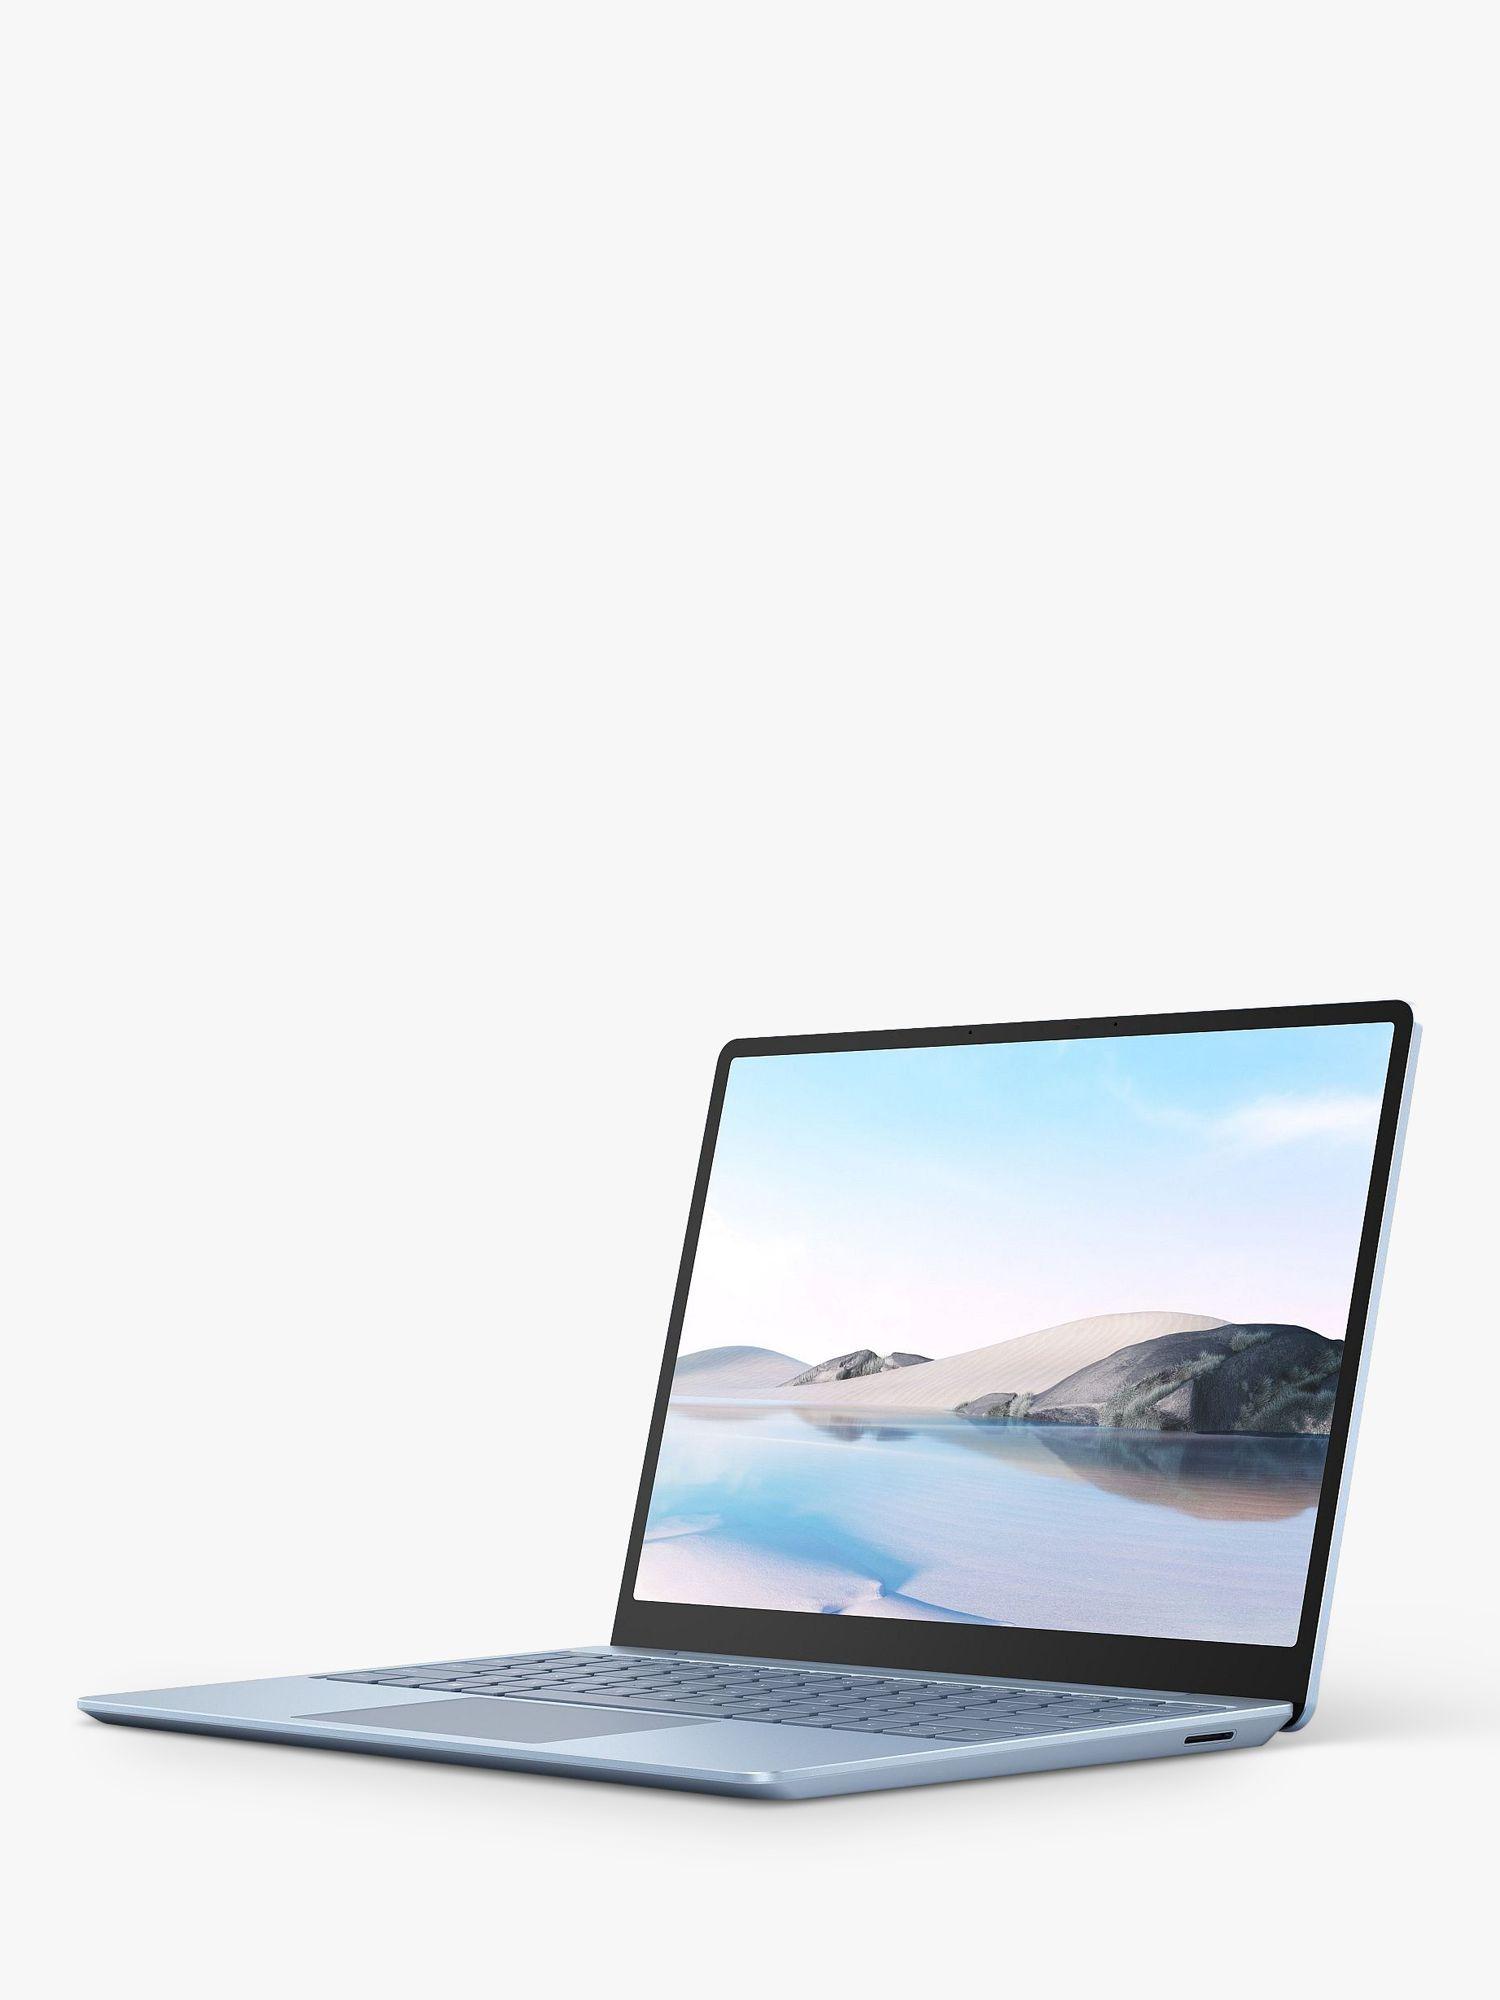 Microsoft Surface Laptop Go, Intel Core i5 Processor, 8GB RAM, 128GB SSD, 12.45 PixelSense Display